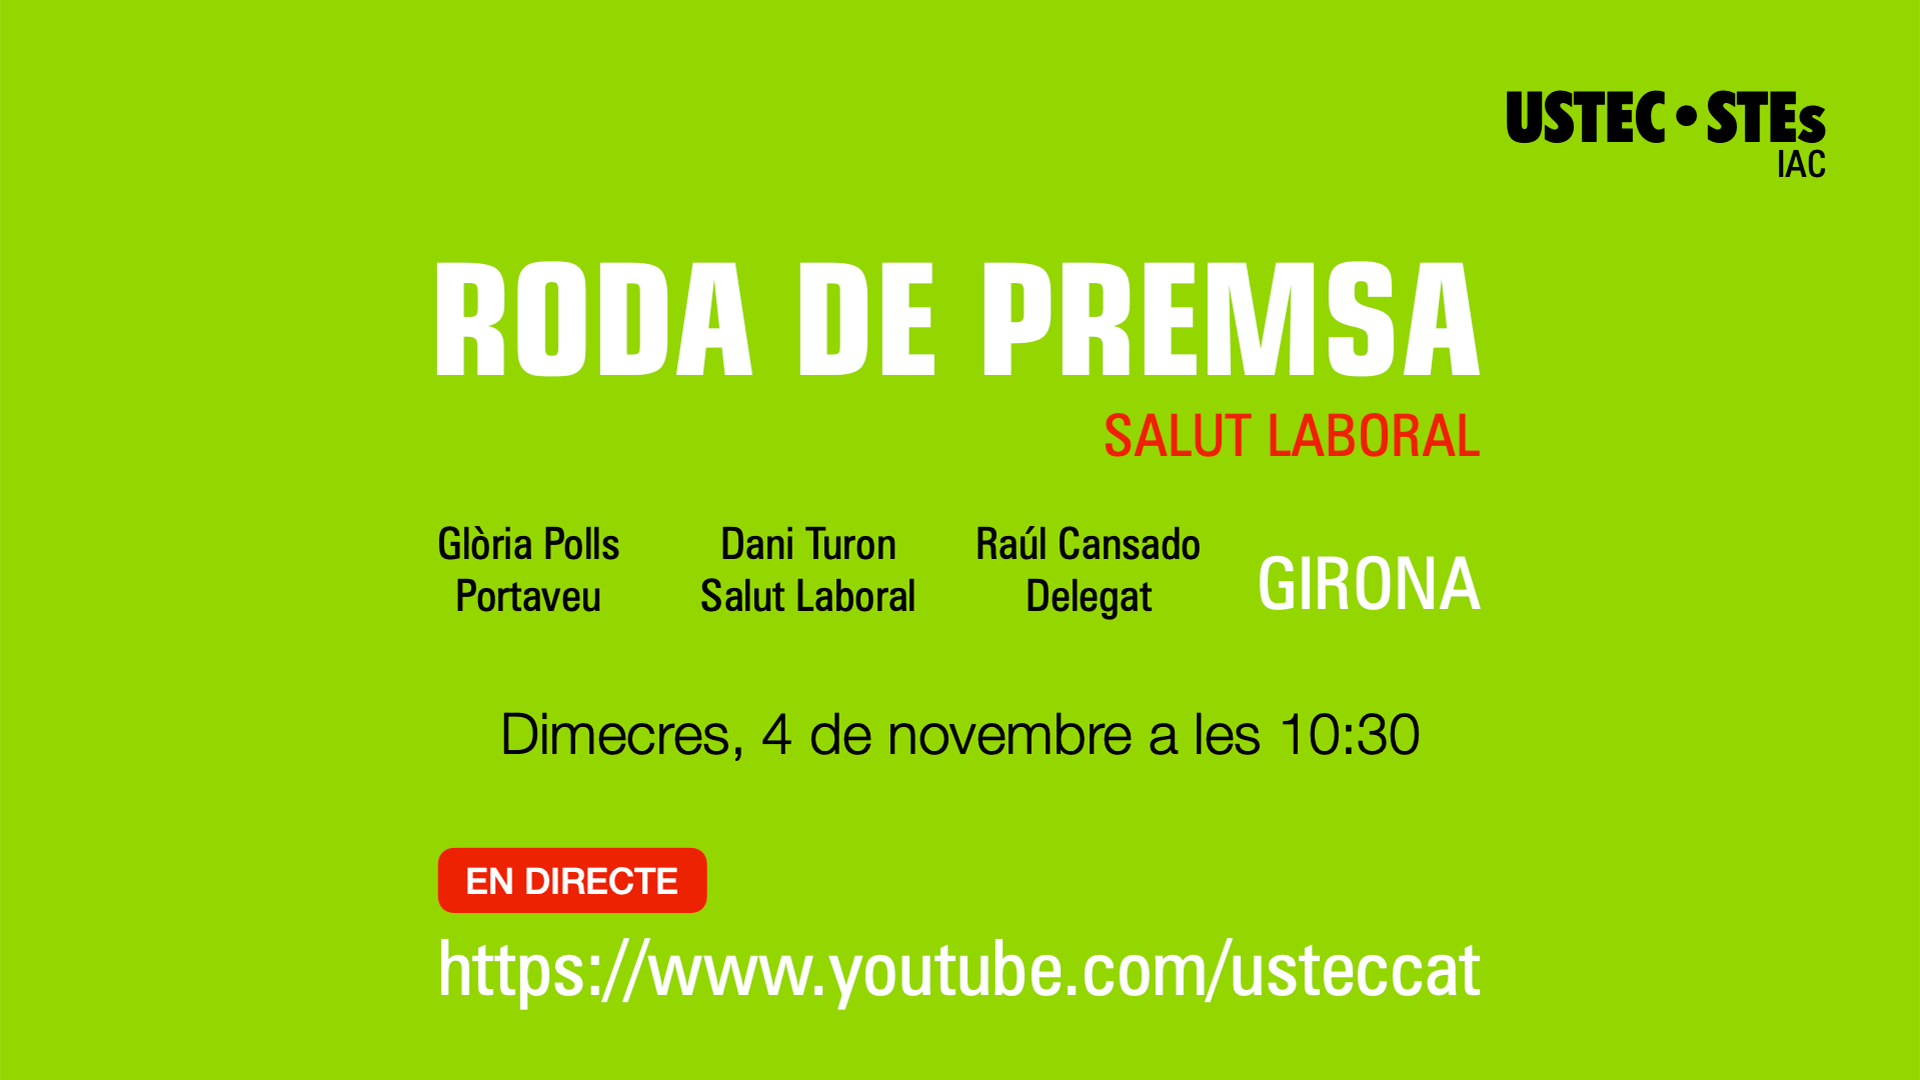 Roda de premsa Salut Laboral Girona 4 novembre 2020 USTEC·STEs